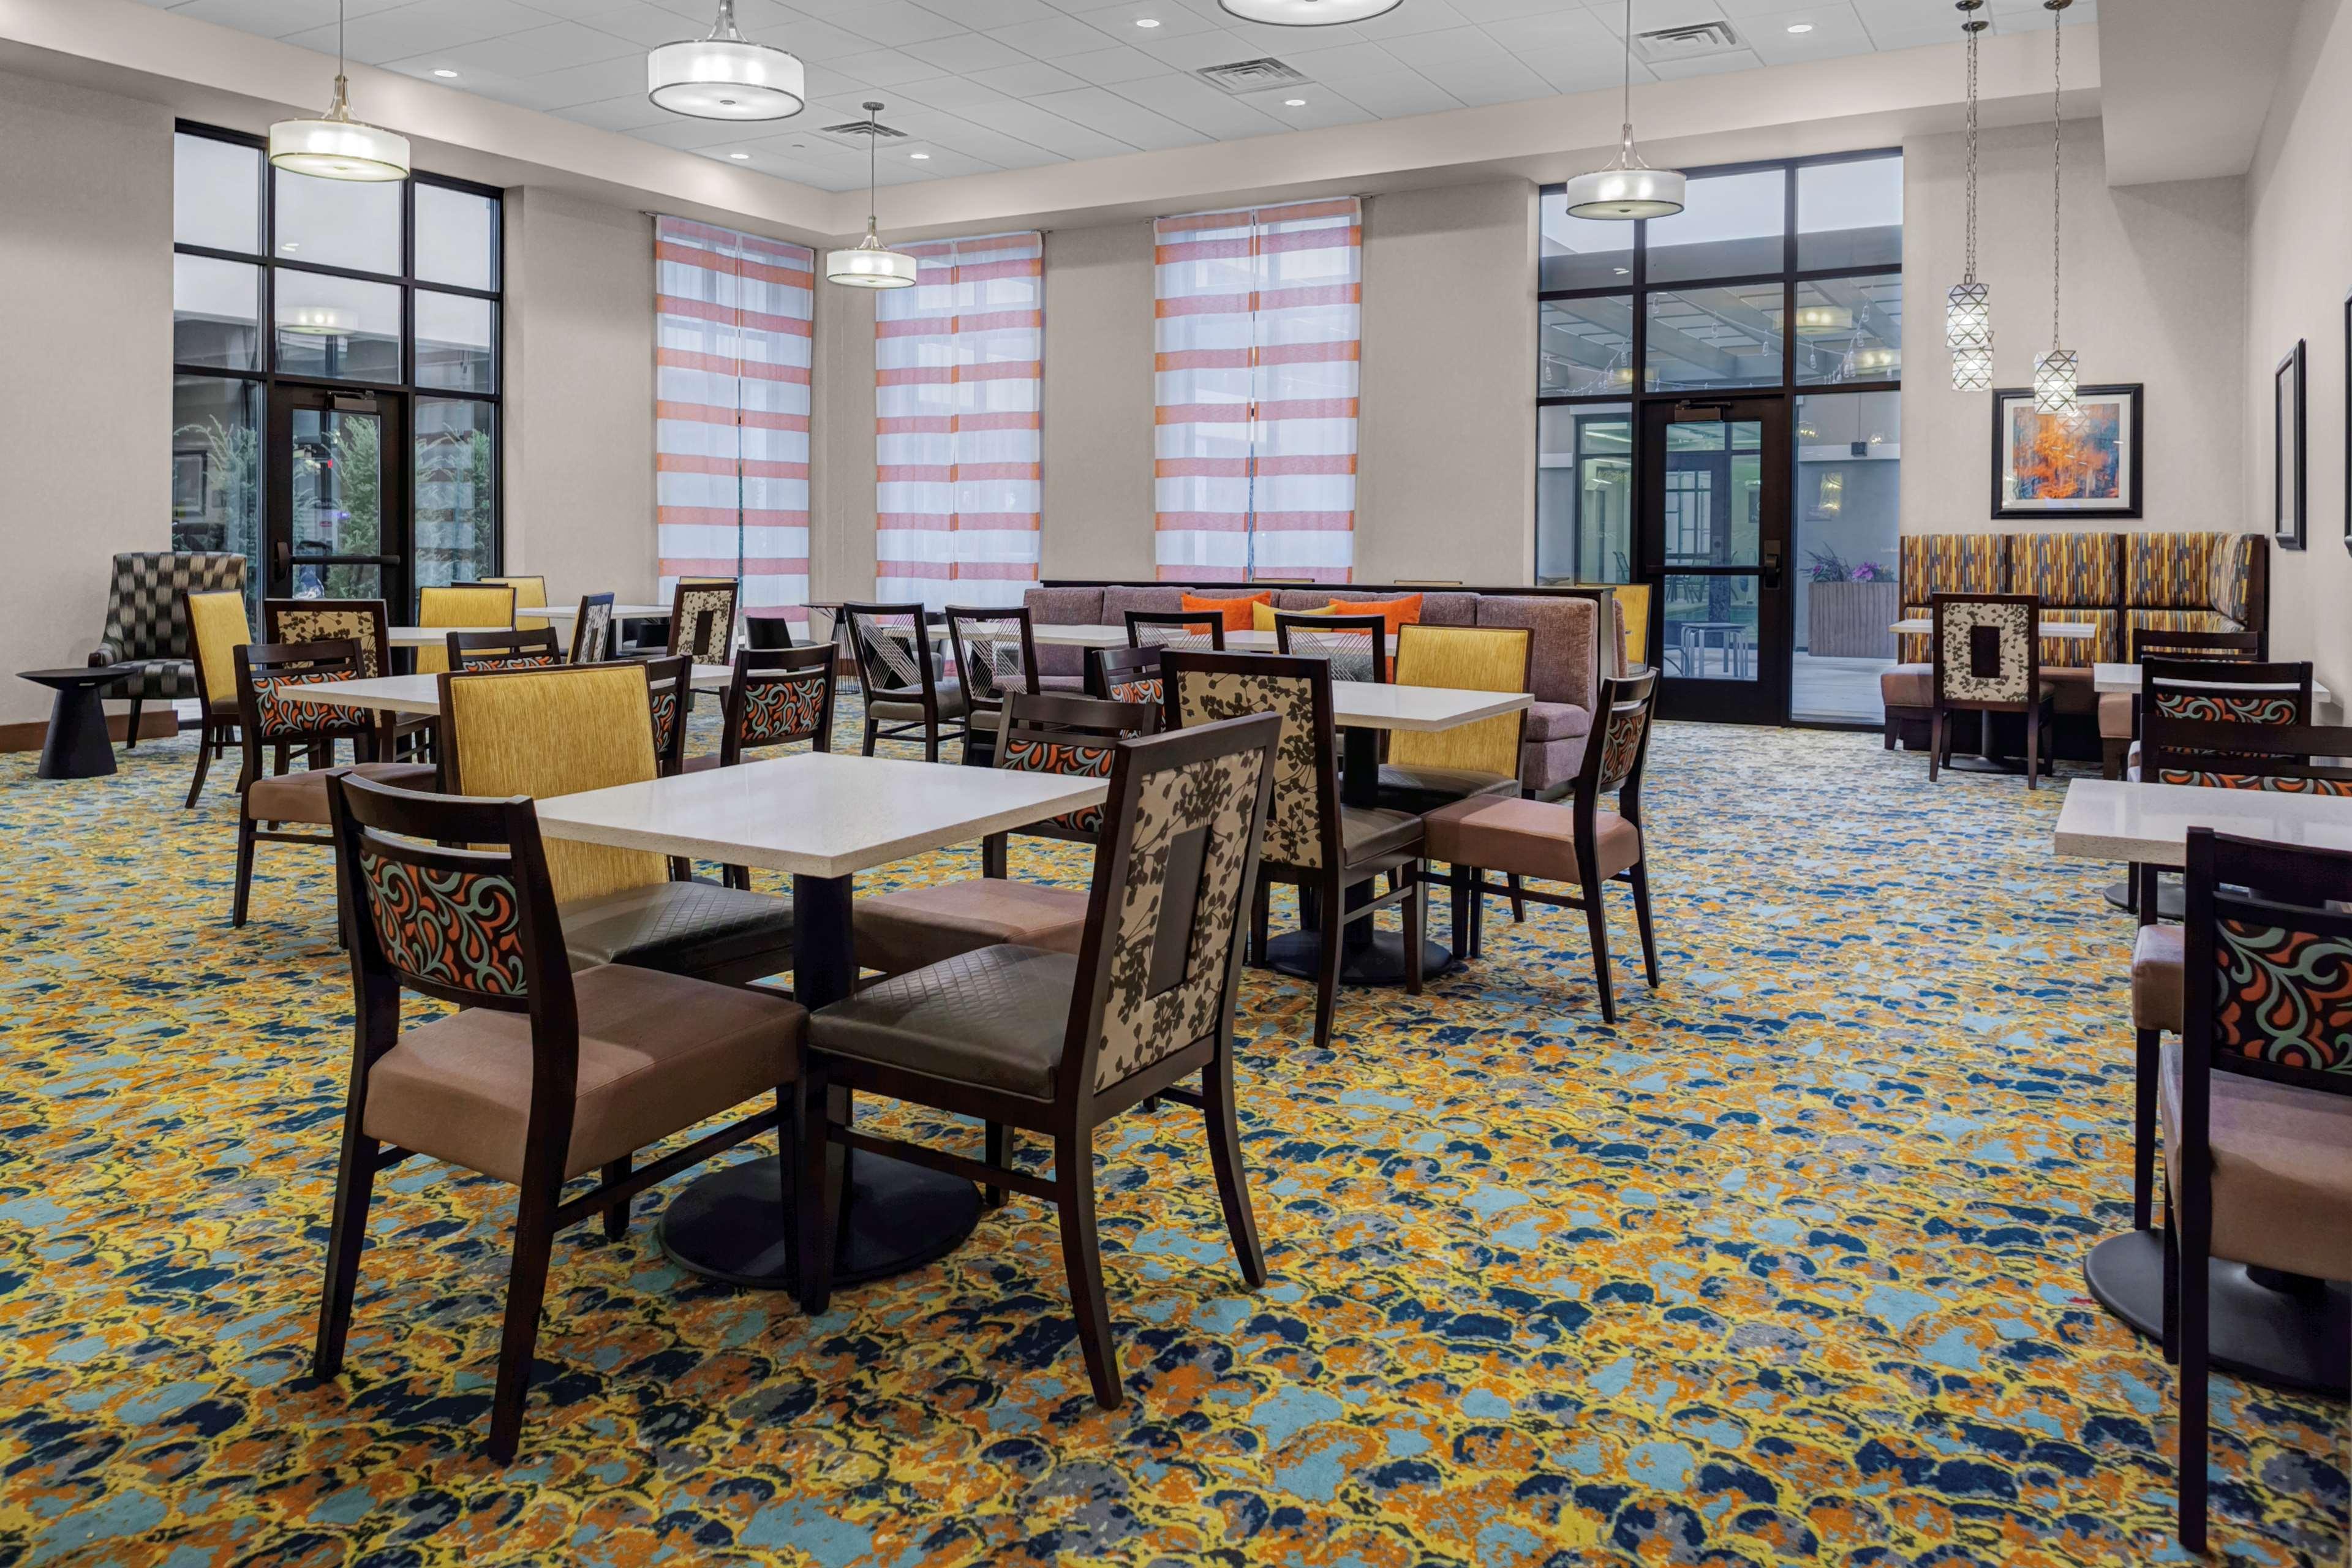 Homewood Suites by Hilton Wauwatosa Milwaukee image 4